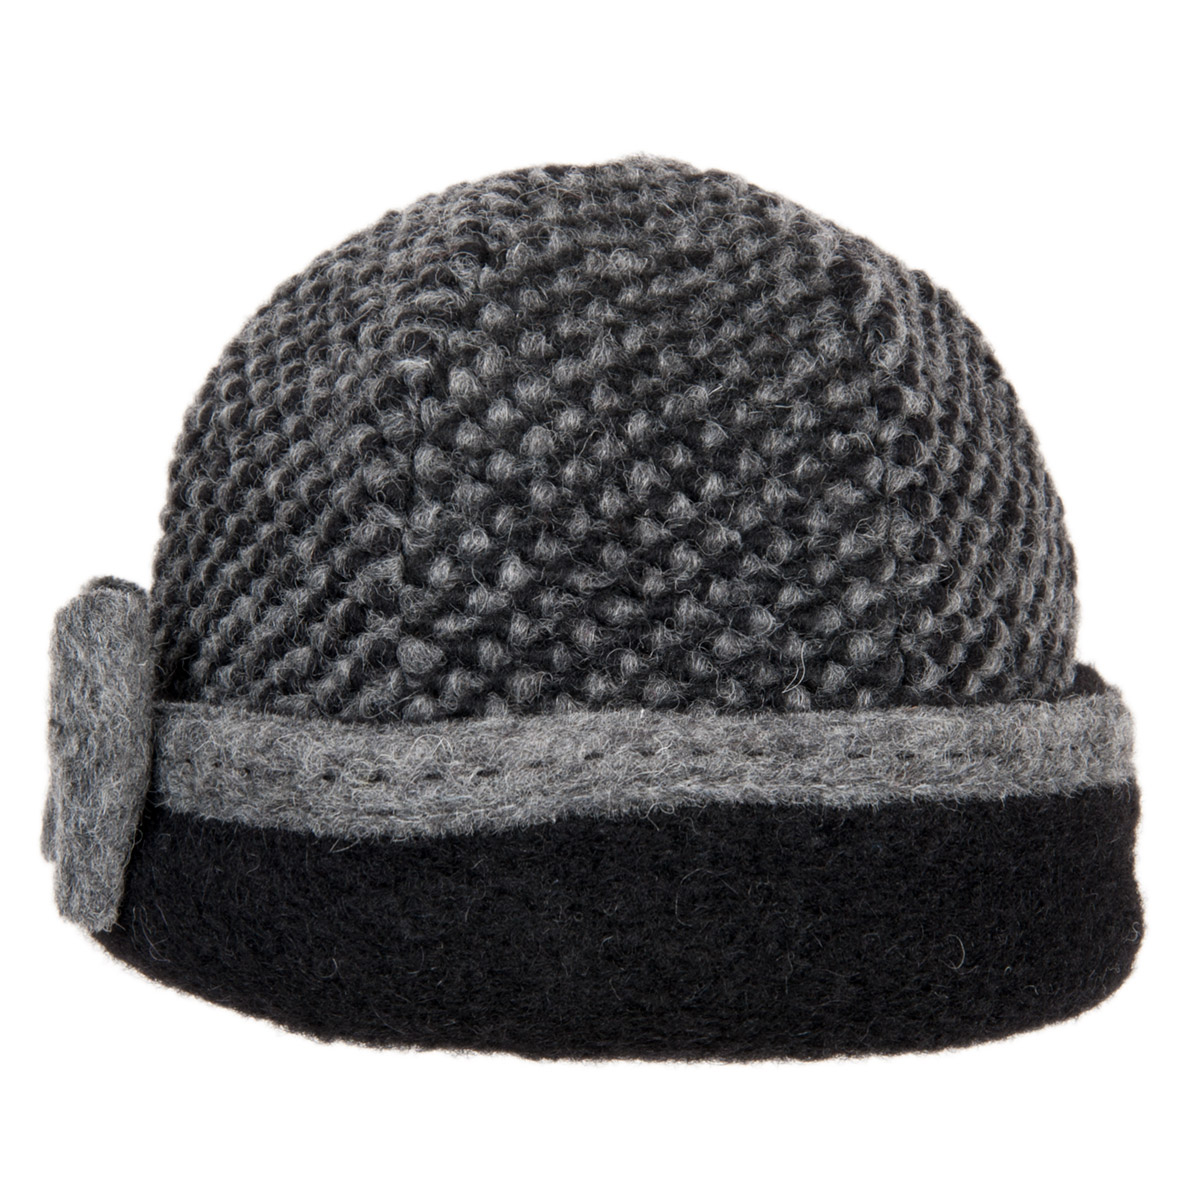 berretto in lana cotta da donna 558c9b251b08